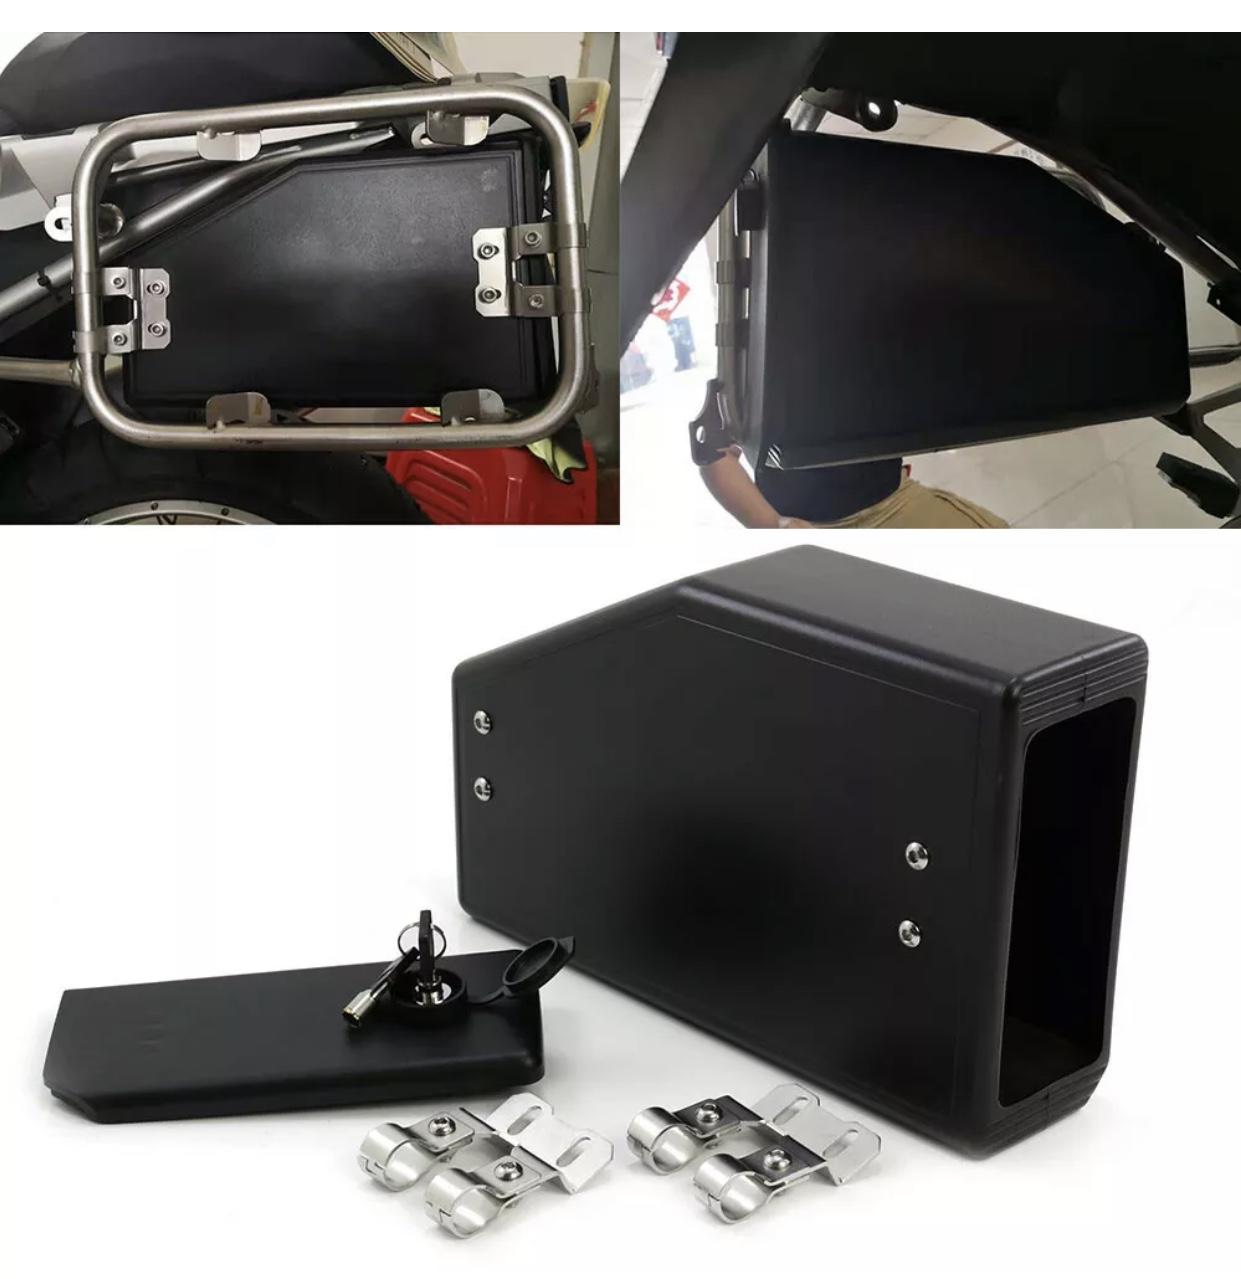 GIDIBII - universal tool box - Guzzi V85